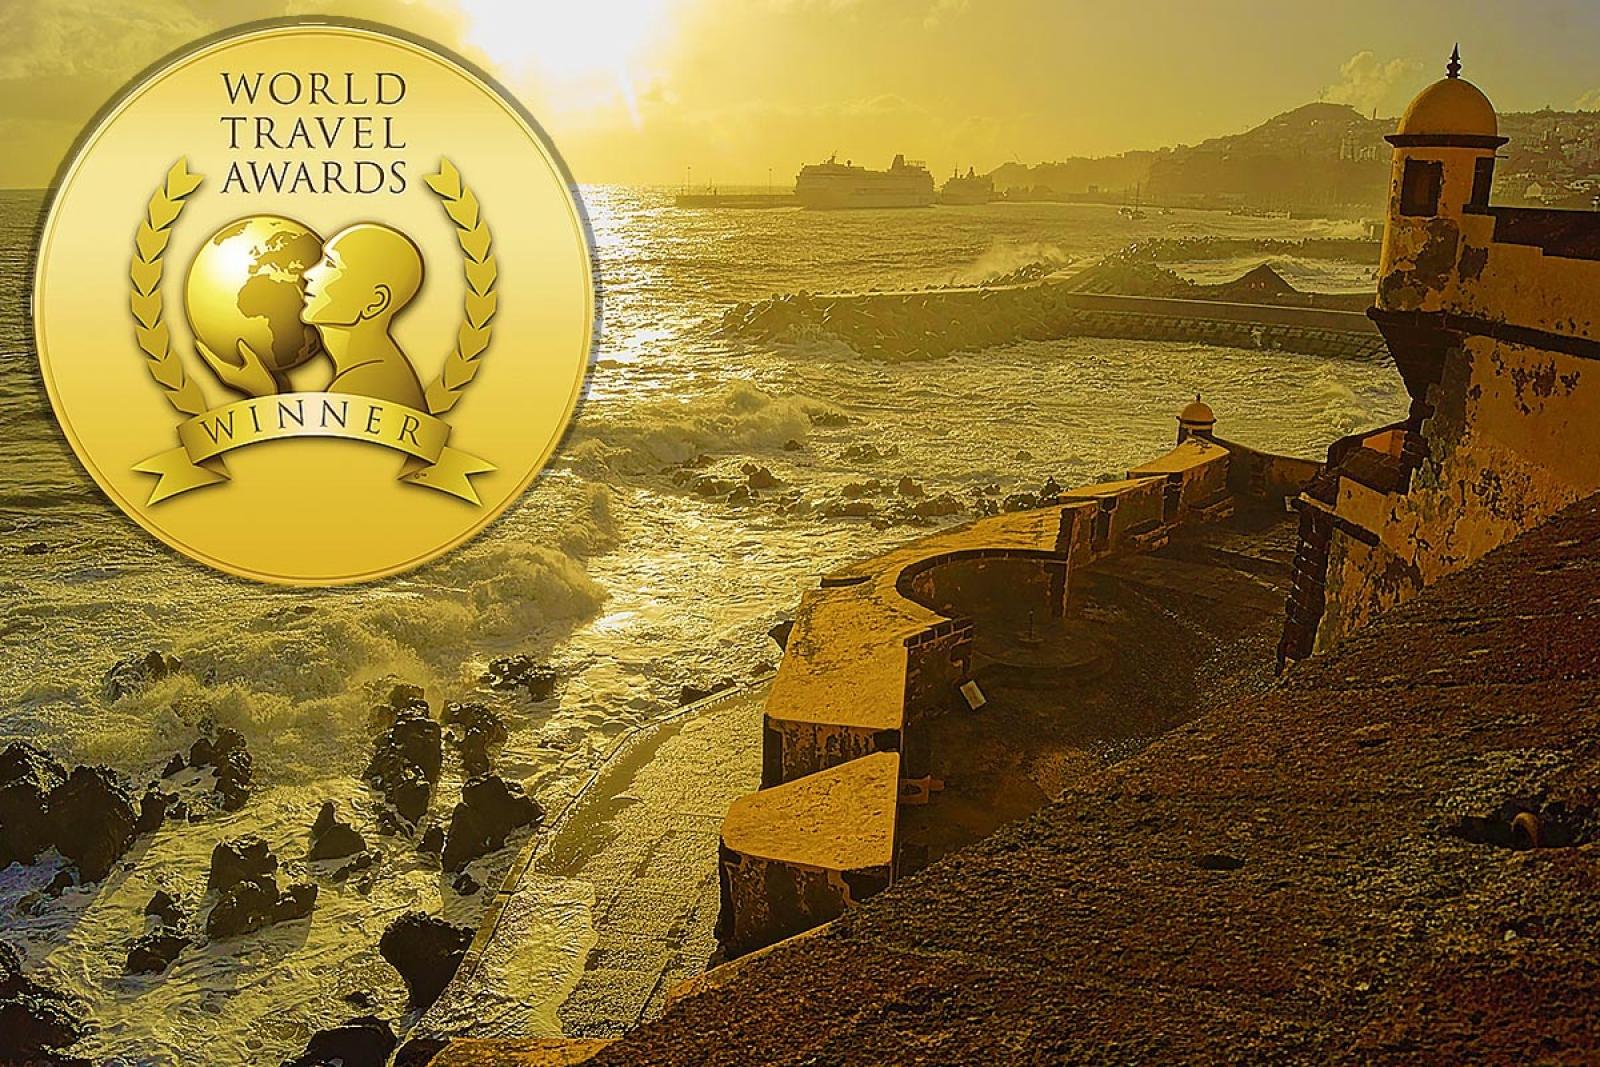 MADEIRA VENCE WORLD TRAVEL AWARDS